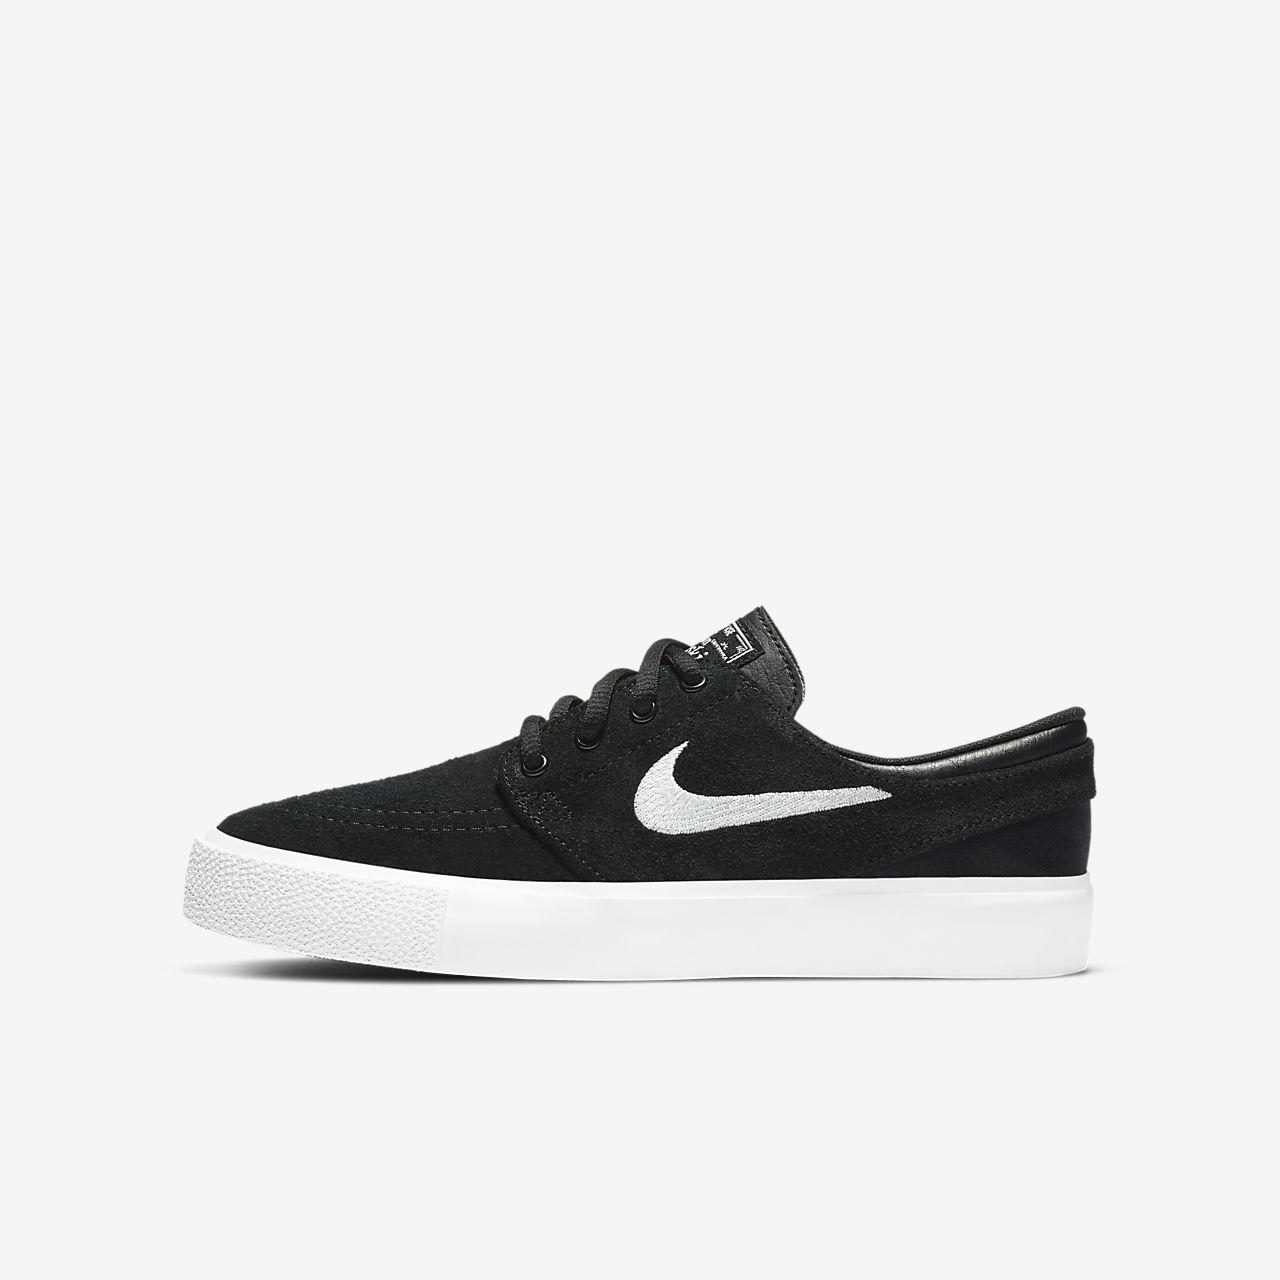 Scarpa da skateboard Nike Zoom Stefan Janoski - Ragazzi